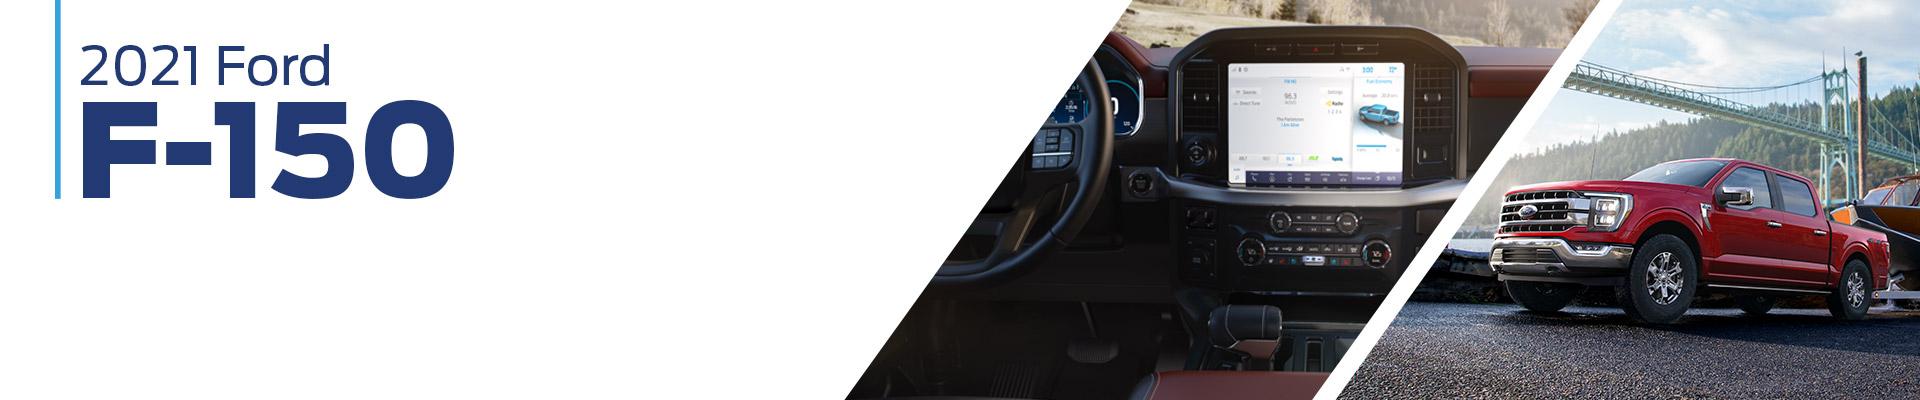 2021 Ford F-150 - Sun State Ford - Orlando, FL